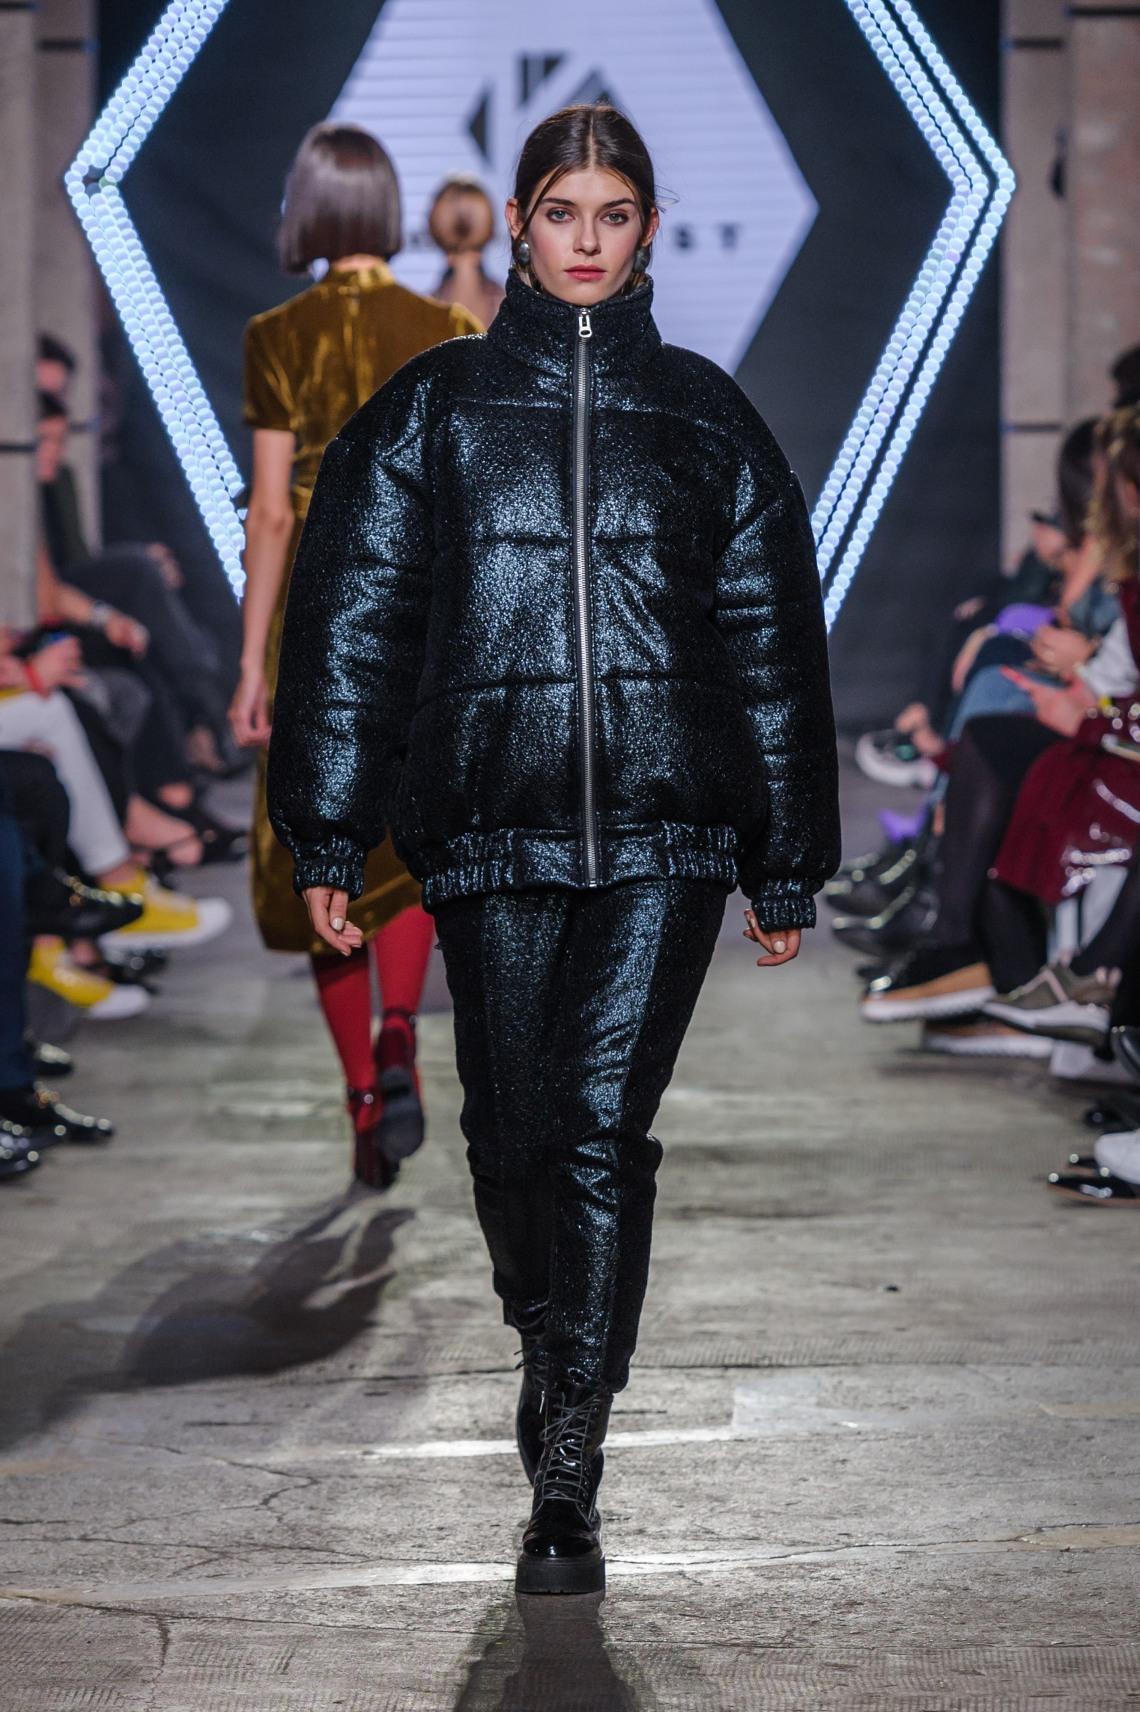 15ktw-101118_15-kaskryst_highres_fotfilipokopny-fashionimages